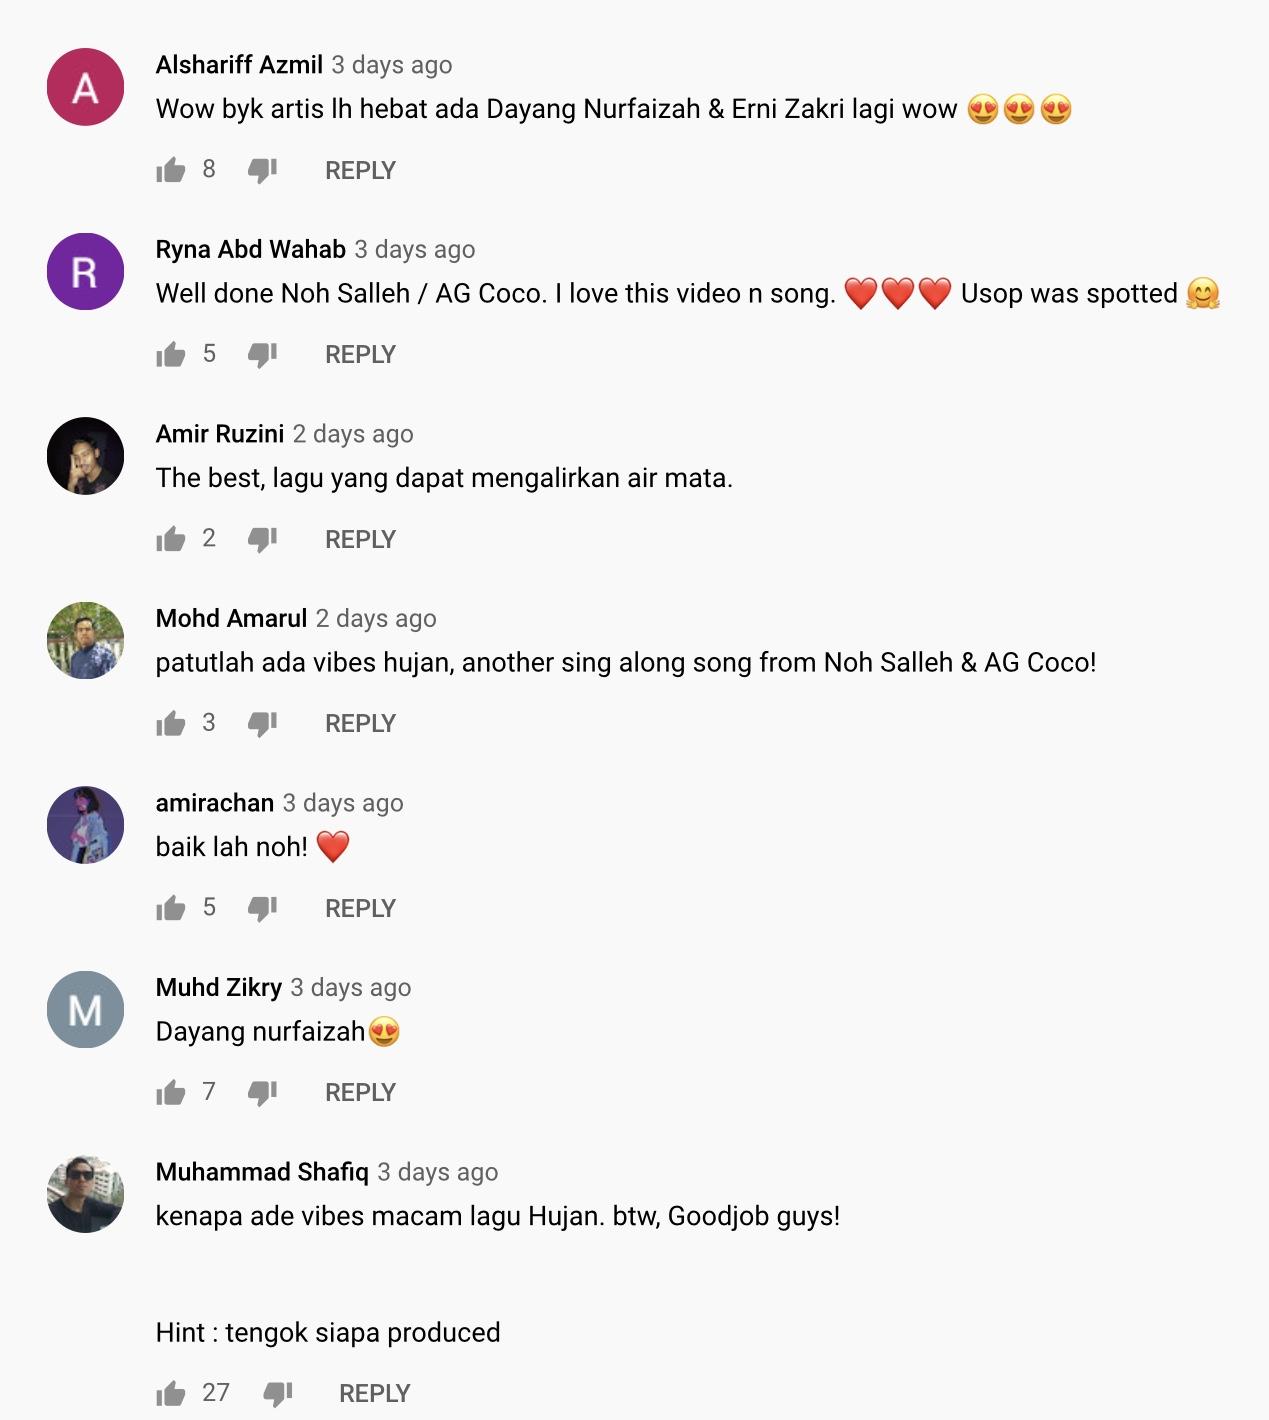 1 Million Views Watch The Viral Sentiasa Di Sini Music Video Featuring 26 Local Artistes Entertainment Rojak Daily Faizal tahir lyrics mit übersetzungen: viral sentiasa di sini music